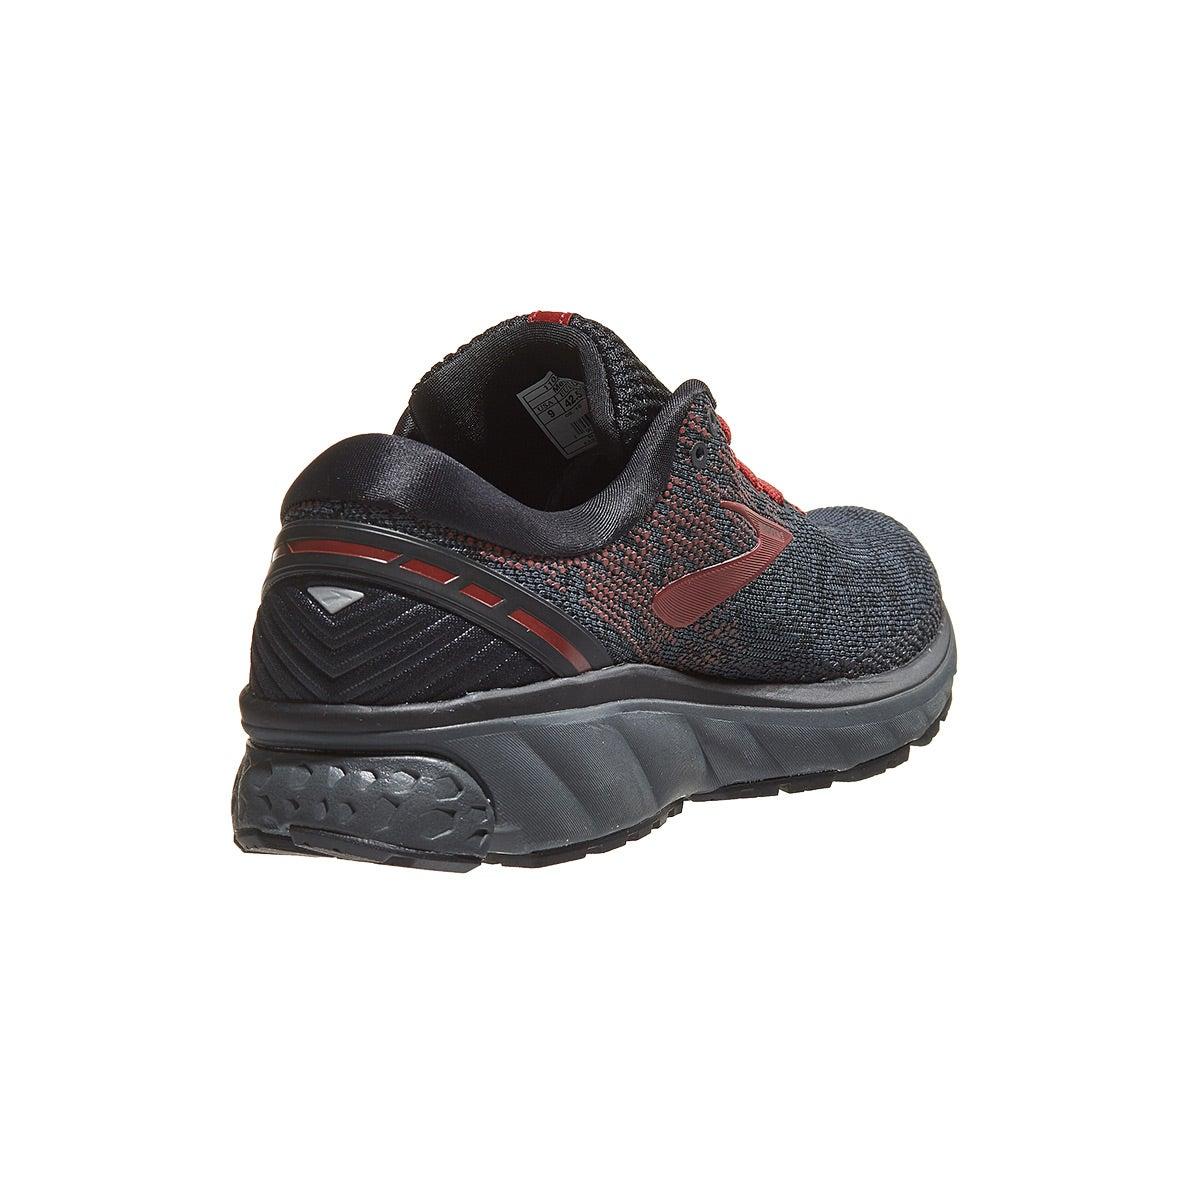 Brooks Ghost 11 Knit Men's Shoes Black